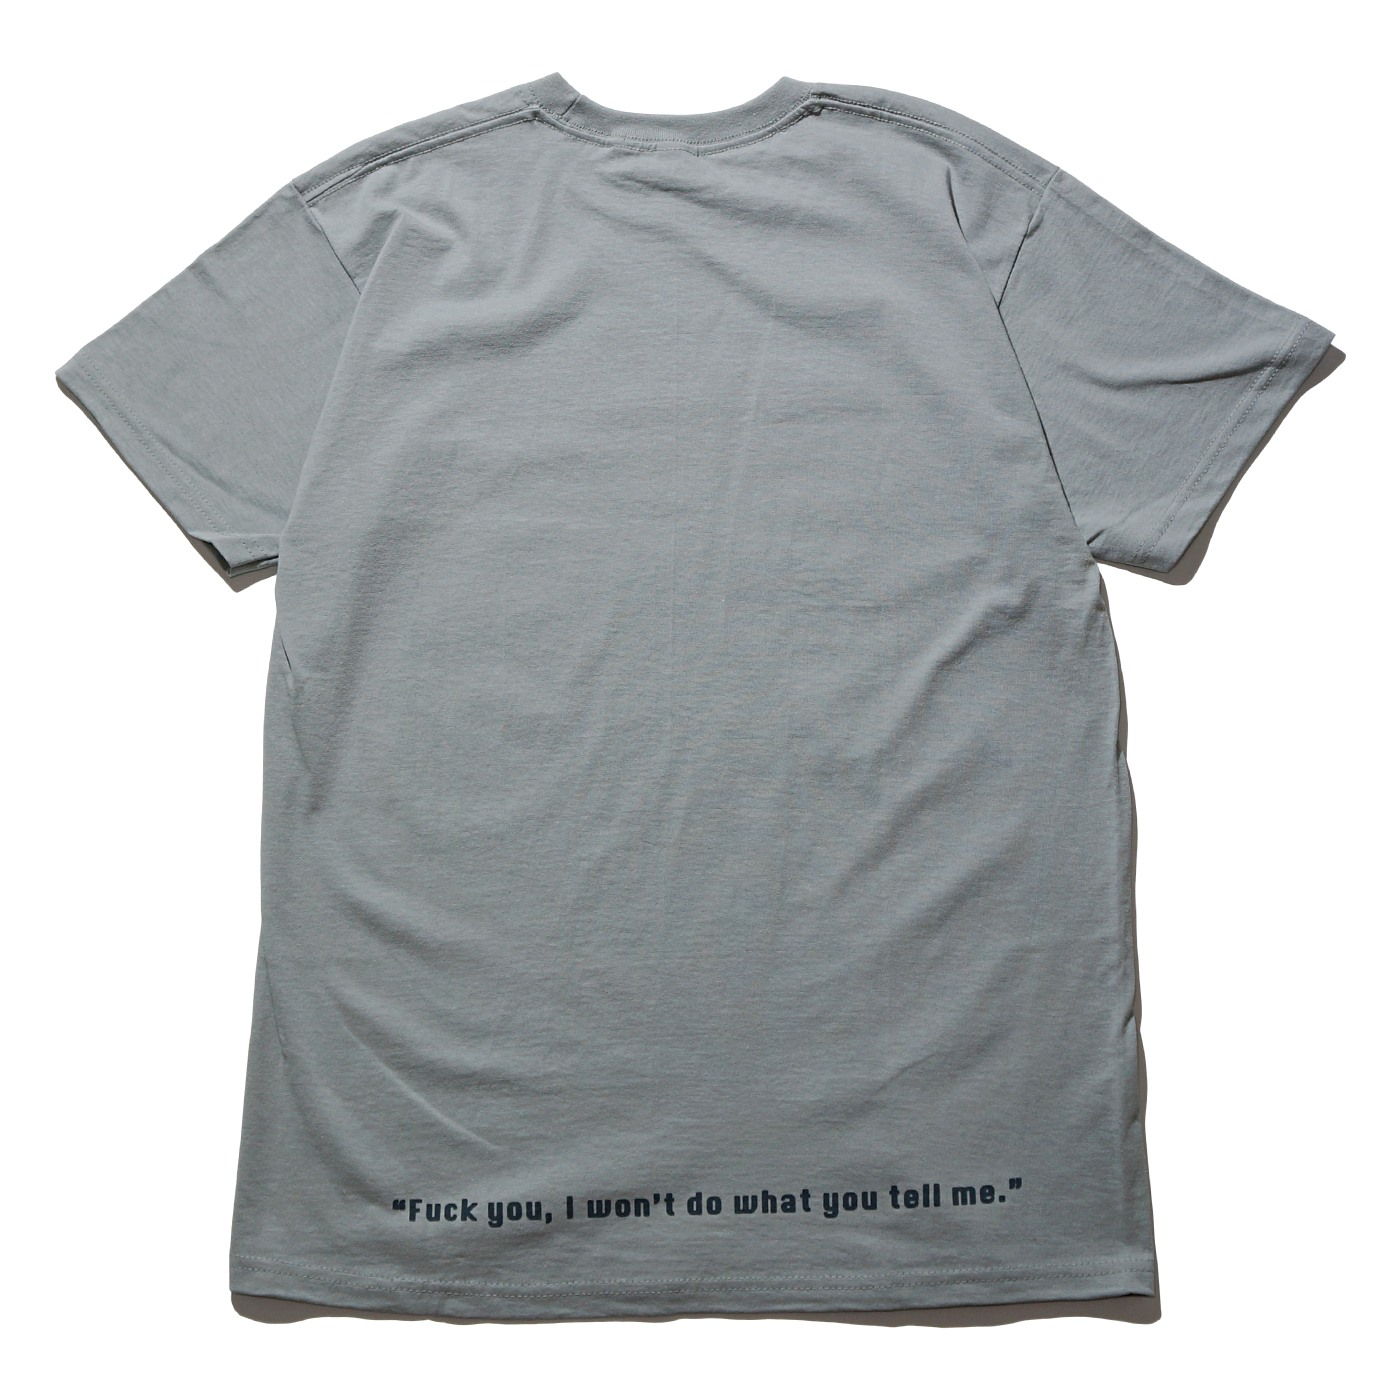 RAGE AGAINST THE MACHINE Tシャツ Wont Do-Grey